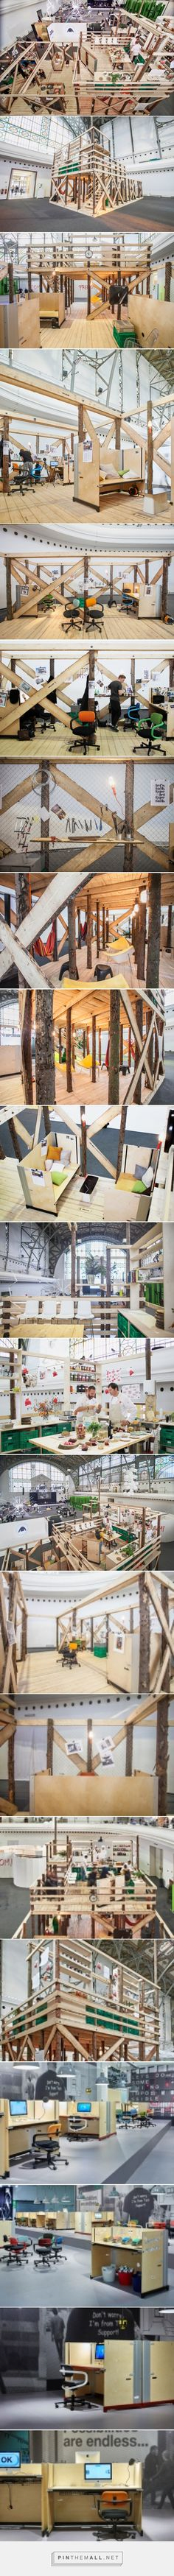 vitra hub at designblok reinterprets furniture by konstantin grcic - created via http://pinthemall.net